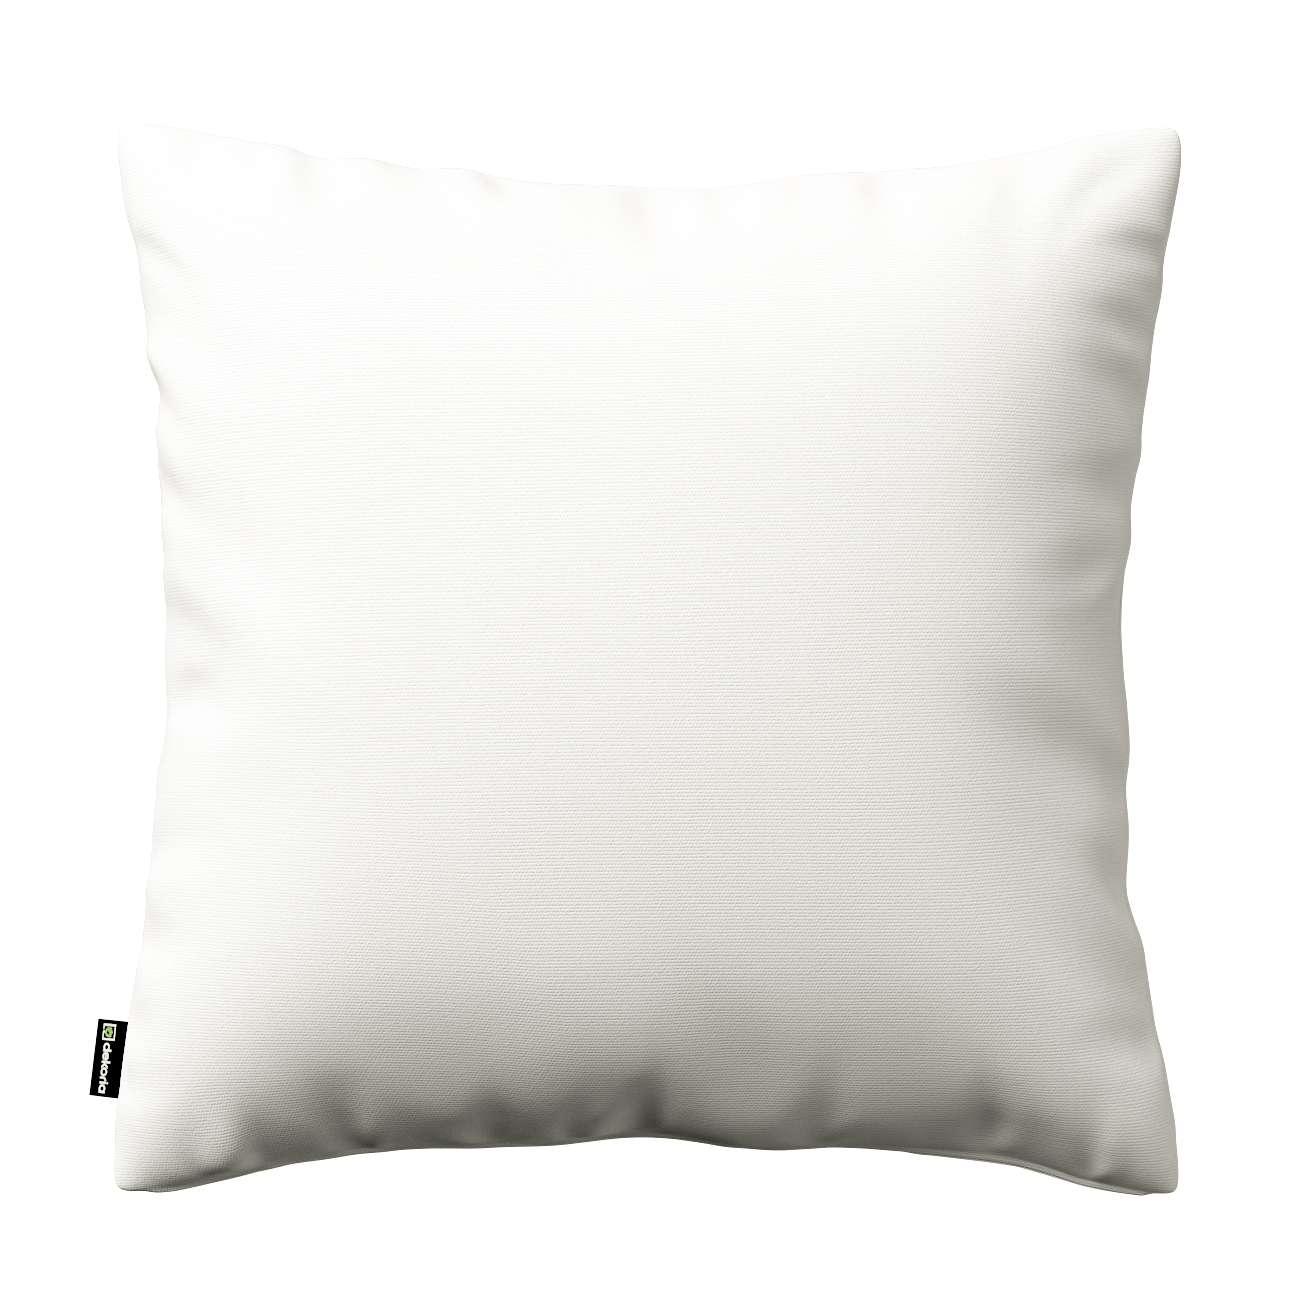 Kinga - potah na polštář jednoduchý v kolekci Cotton Panama, látka: 702-34